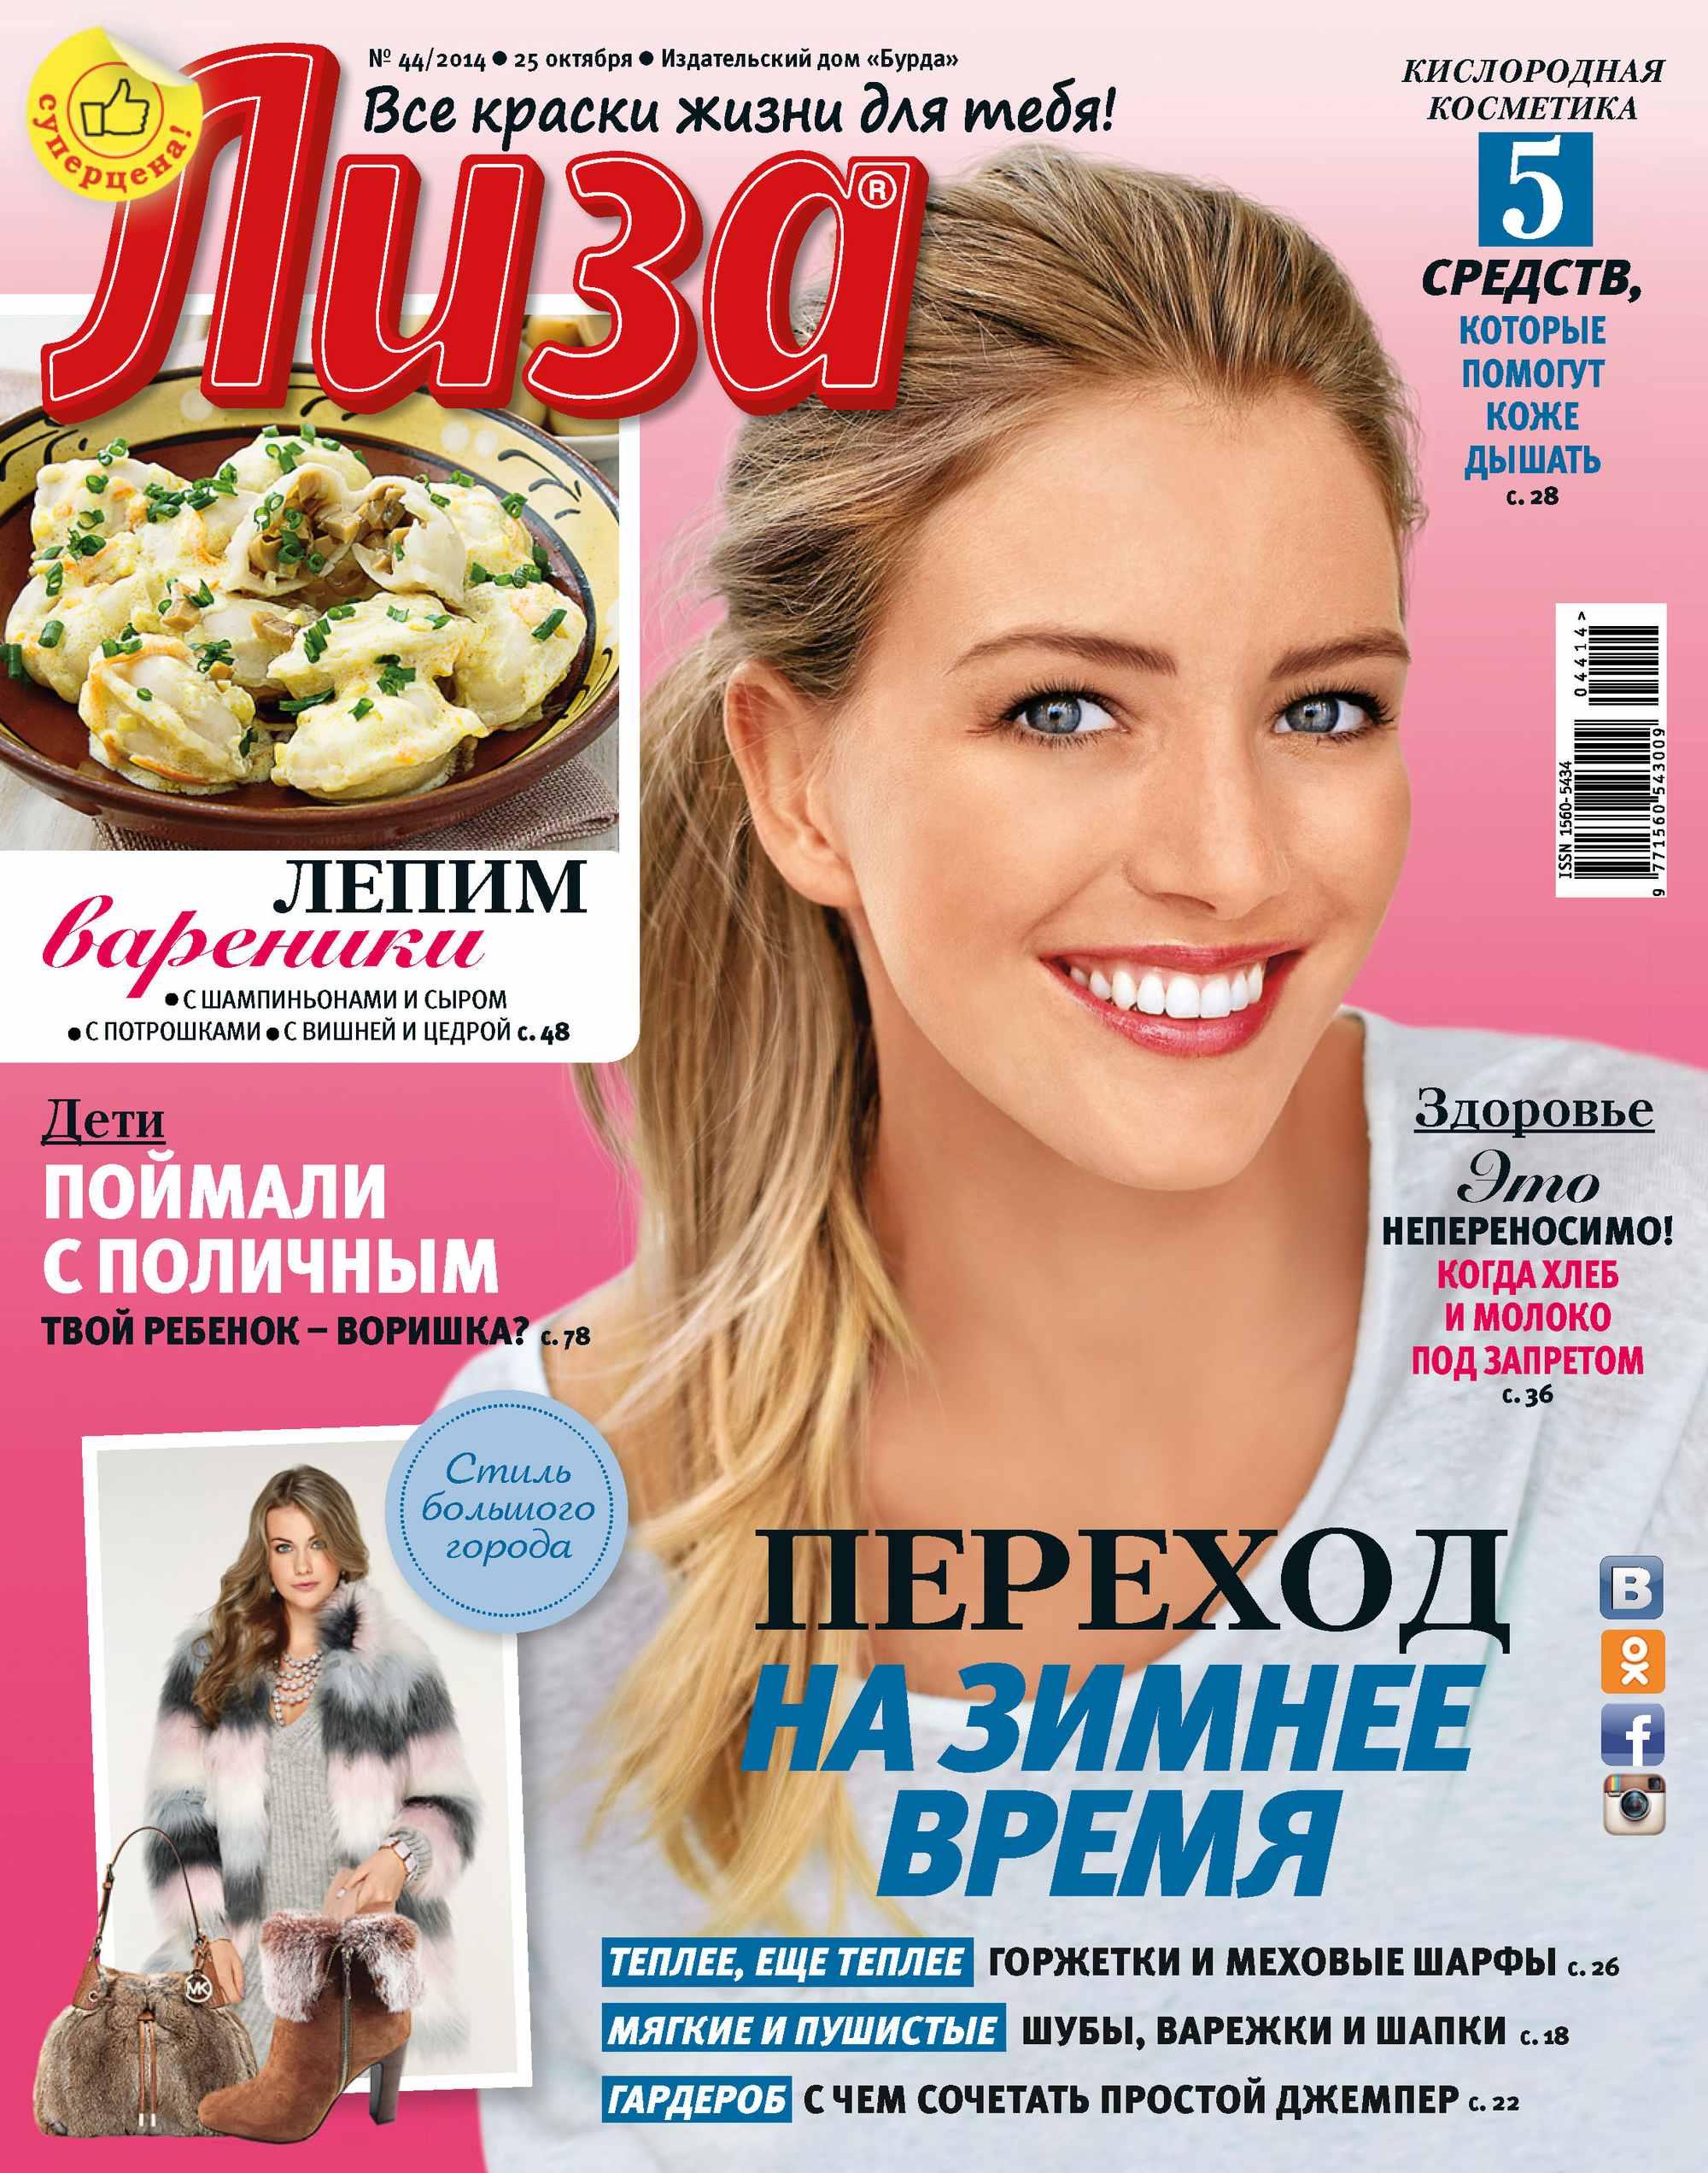 ИД «Бурда» Журнал «Лиза» №44/2014 ид бурда журнал лиза 38 2014